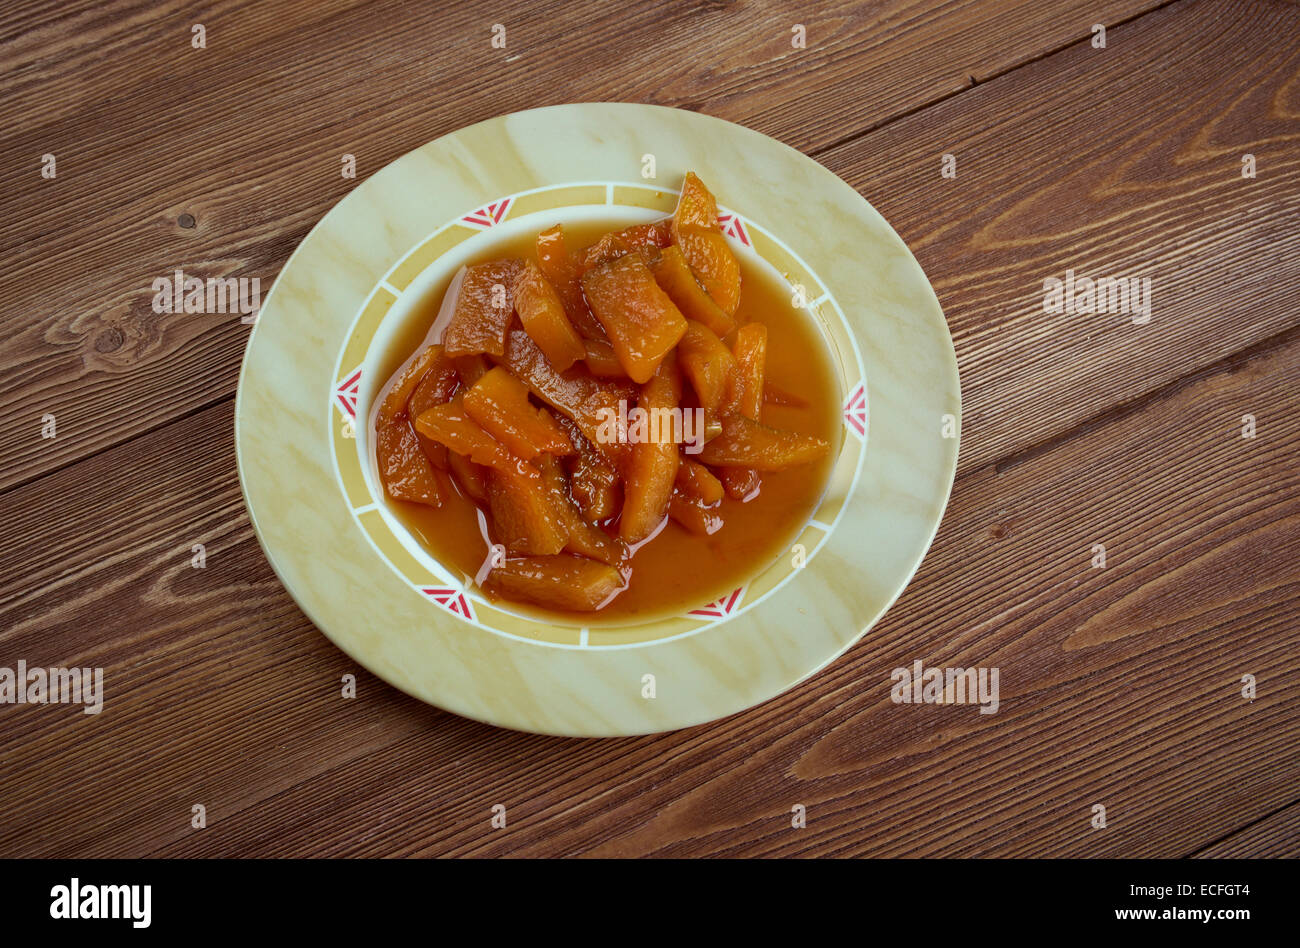 Calabaza con azucar moreno - Mexican dish of pumpkin and brown sugar - Stock Image